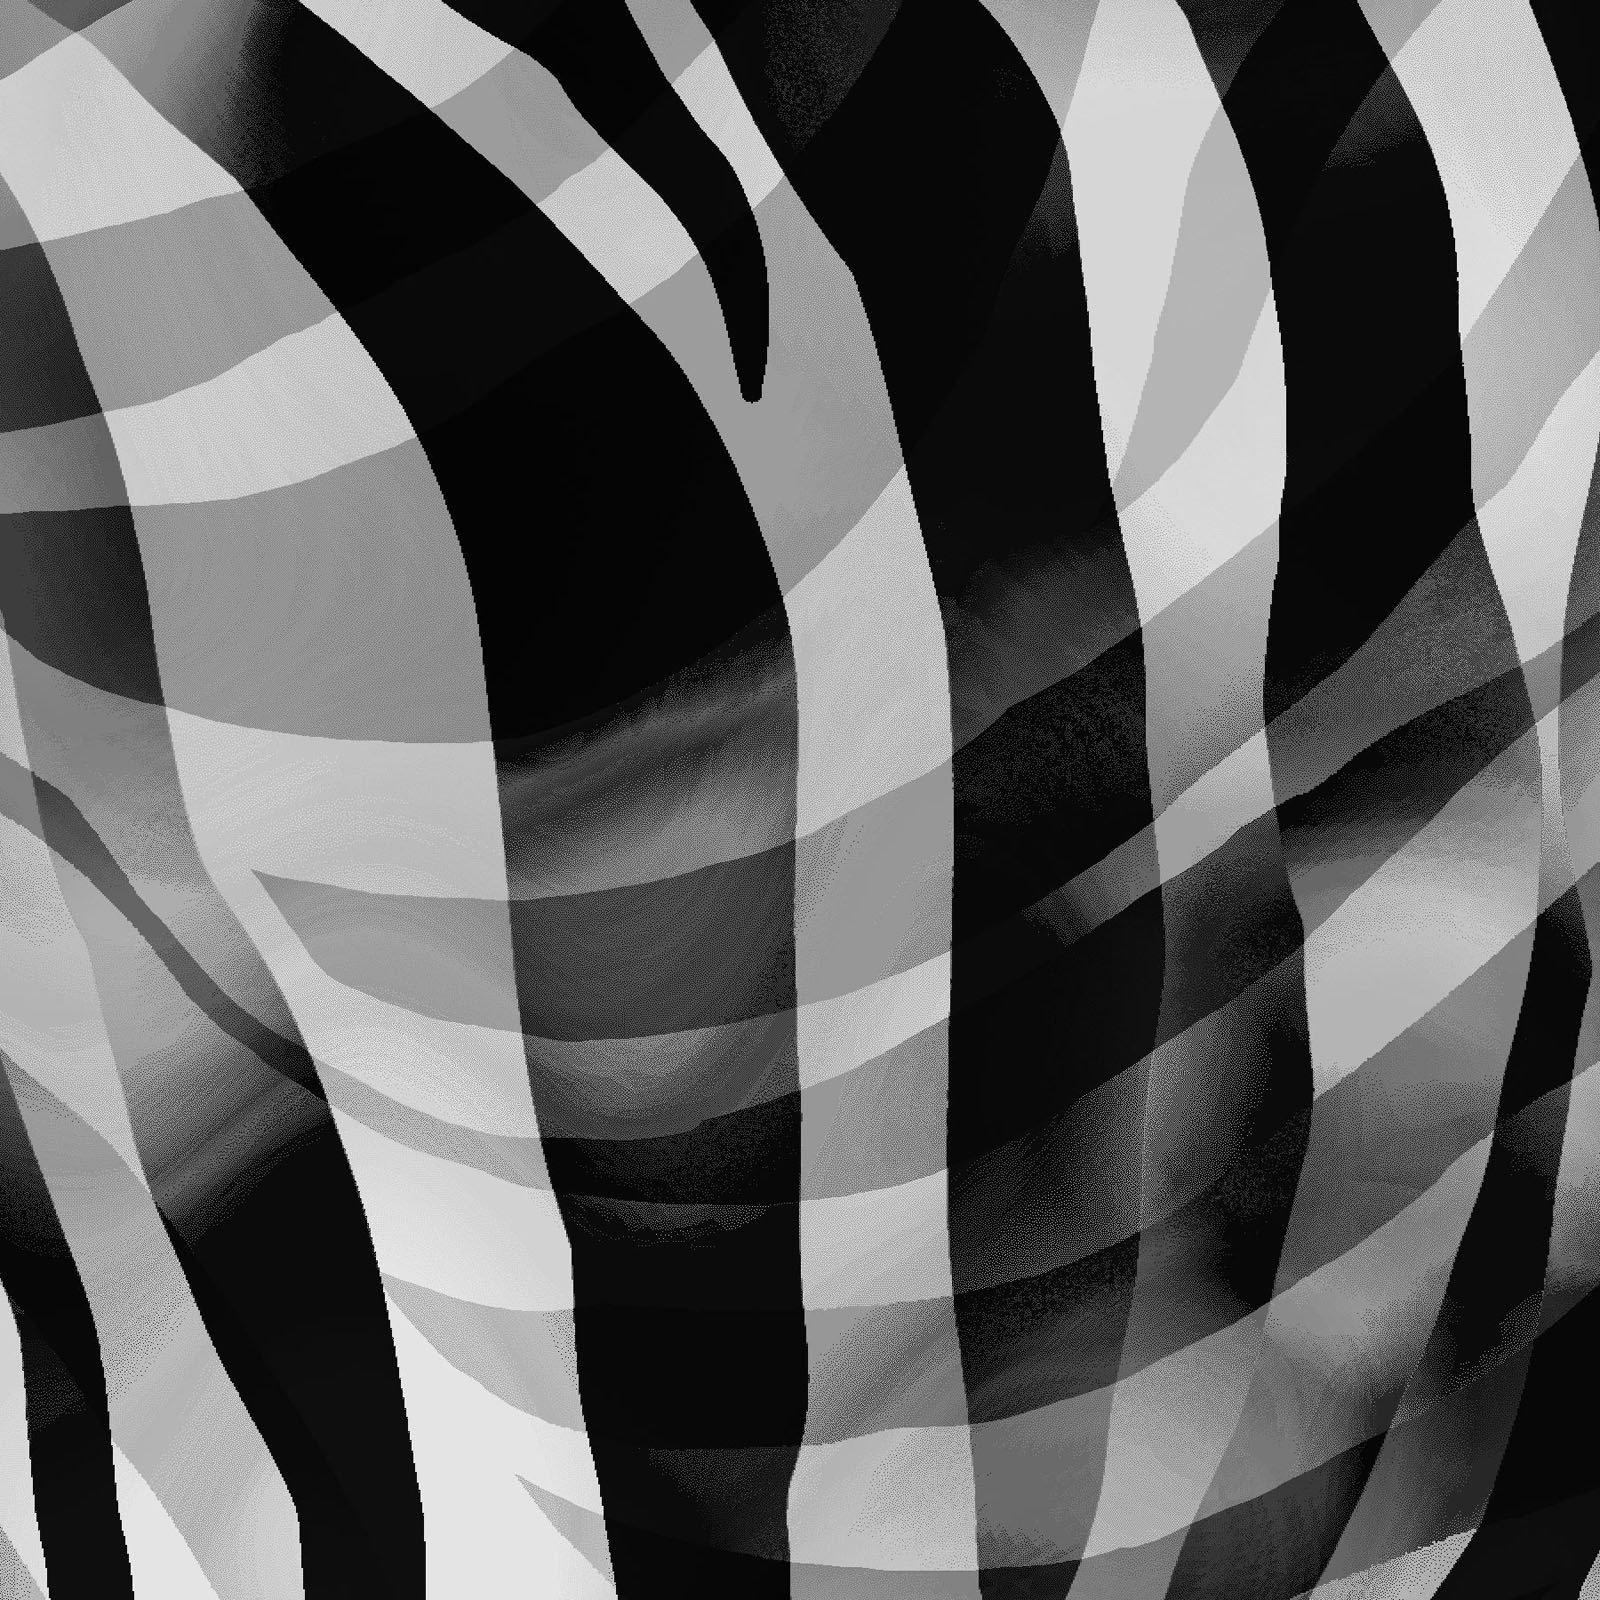 Henry Glass - Zebra Skins  - Black and White Zebra